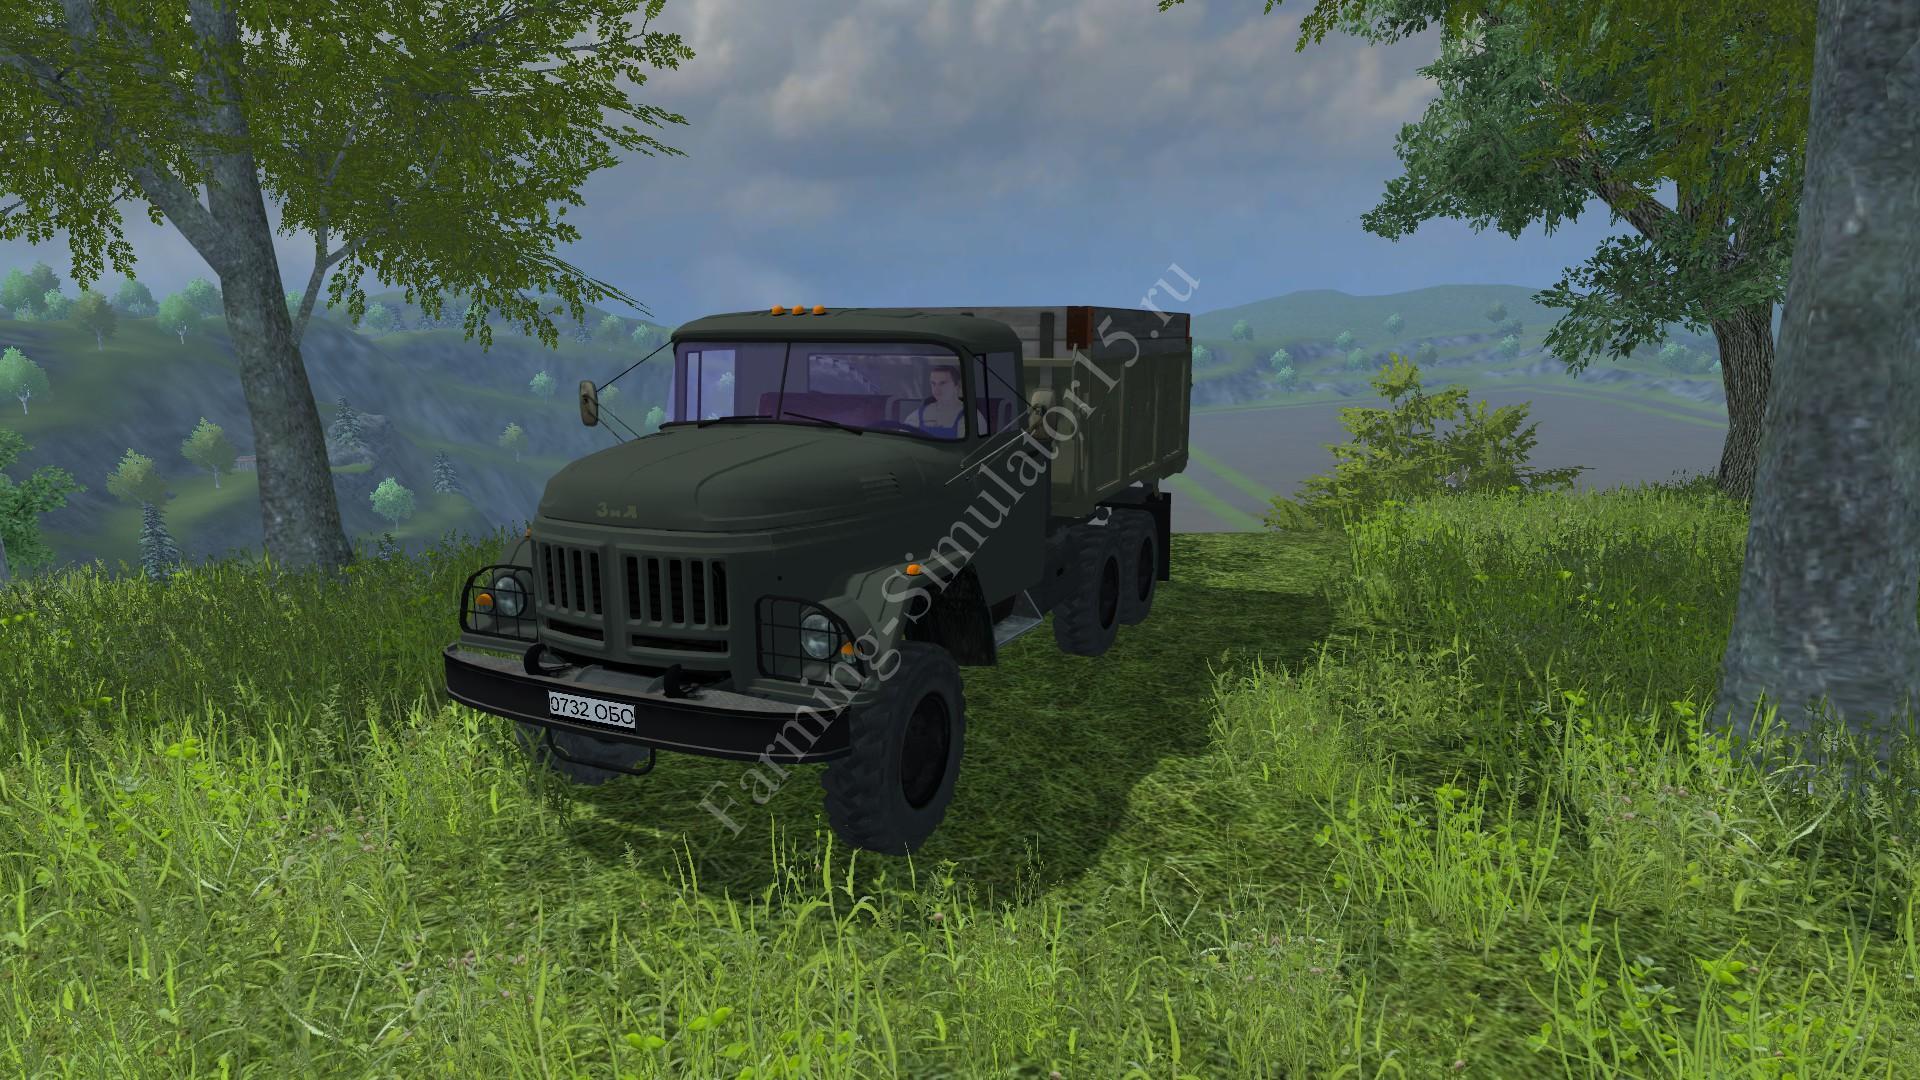 Мод грузовика ZiL 131 Amur v 1.0 Farming Simulator 2013, Farming Simulator 13